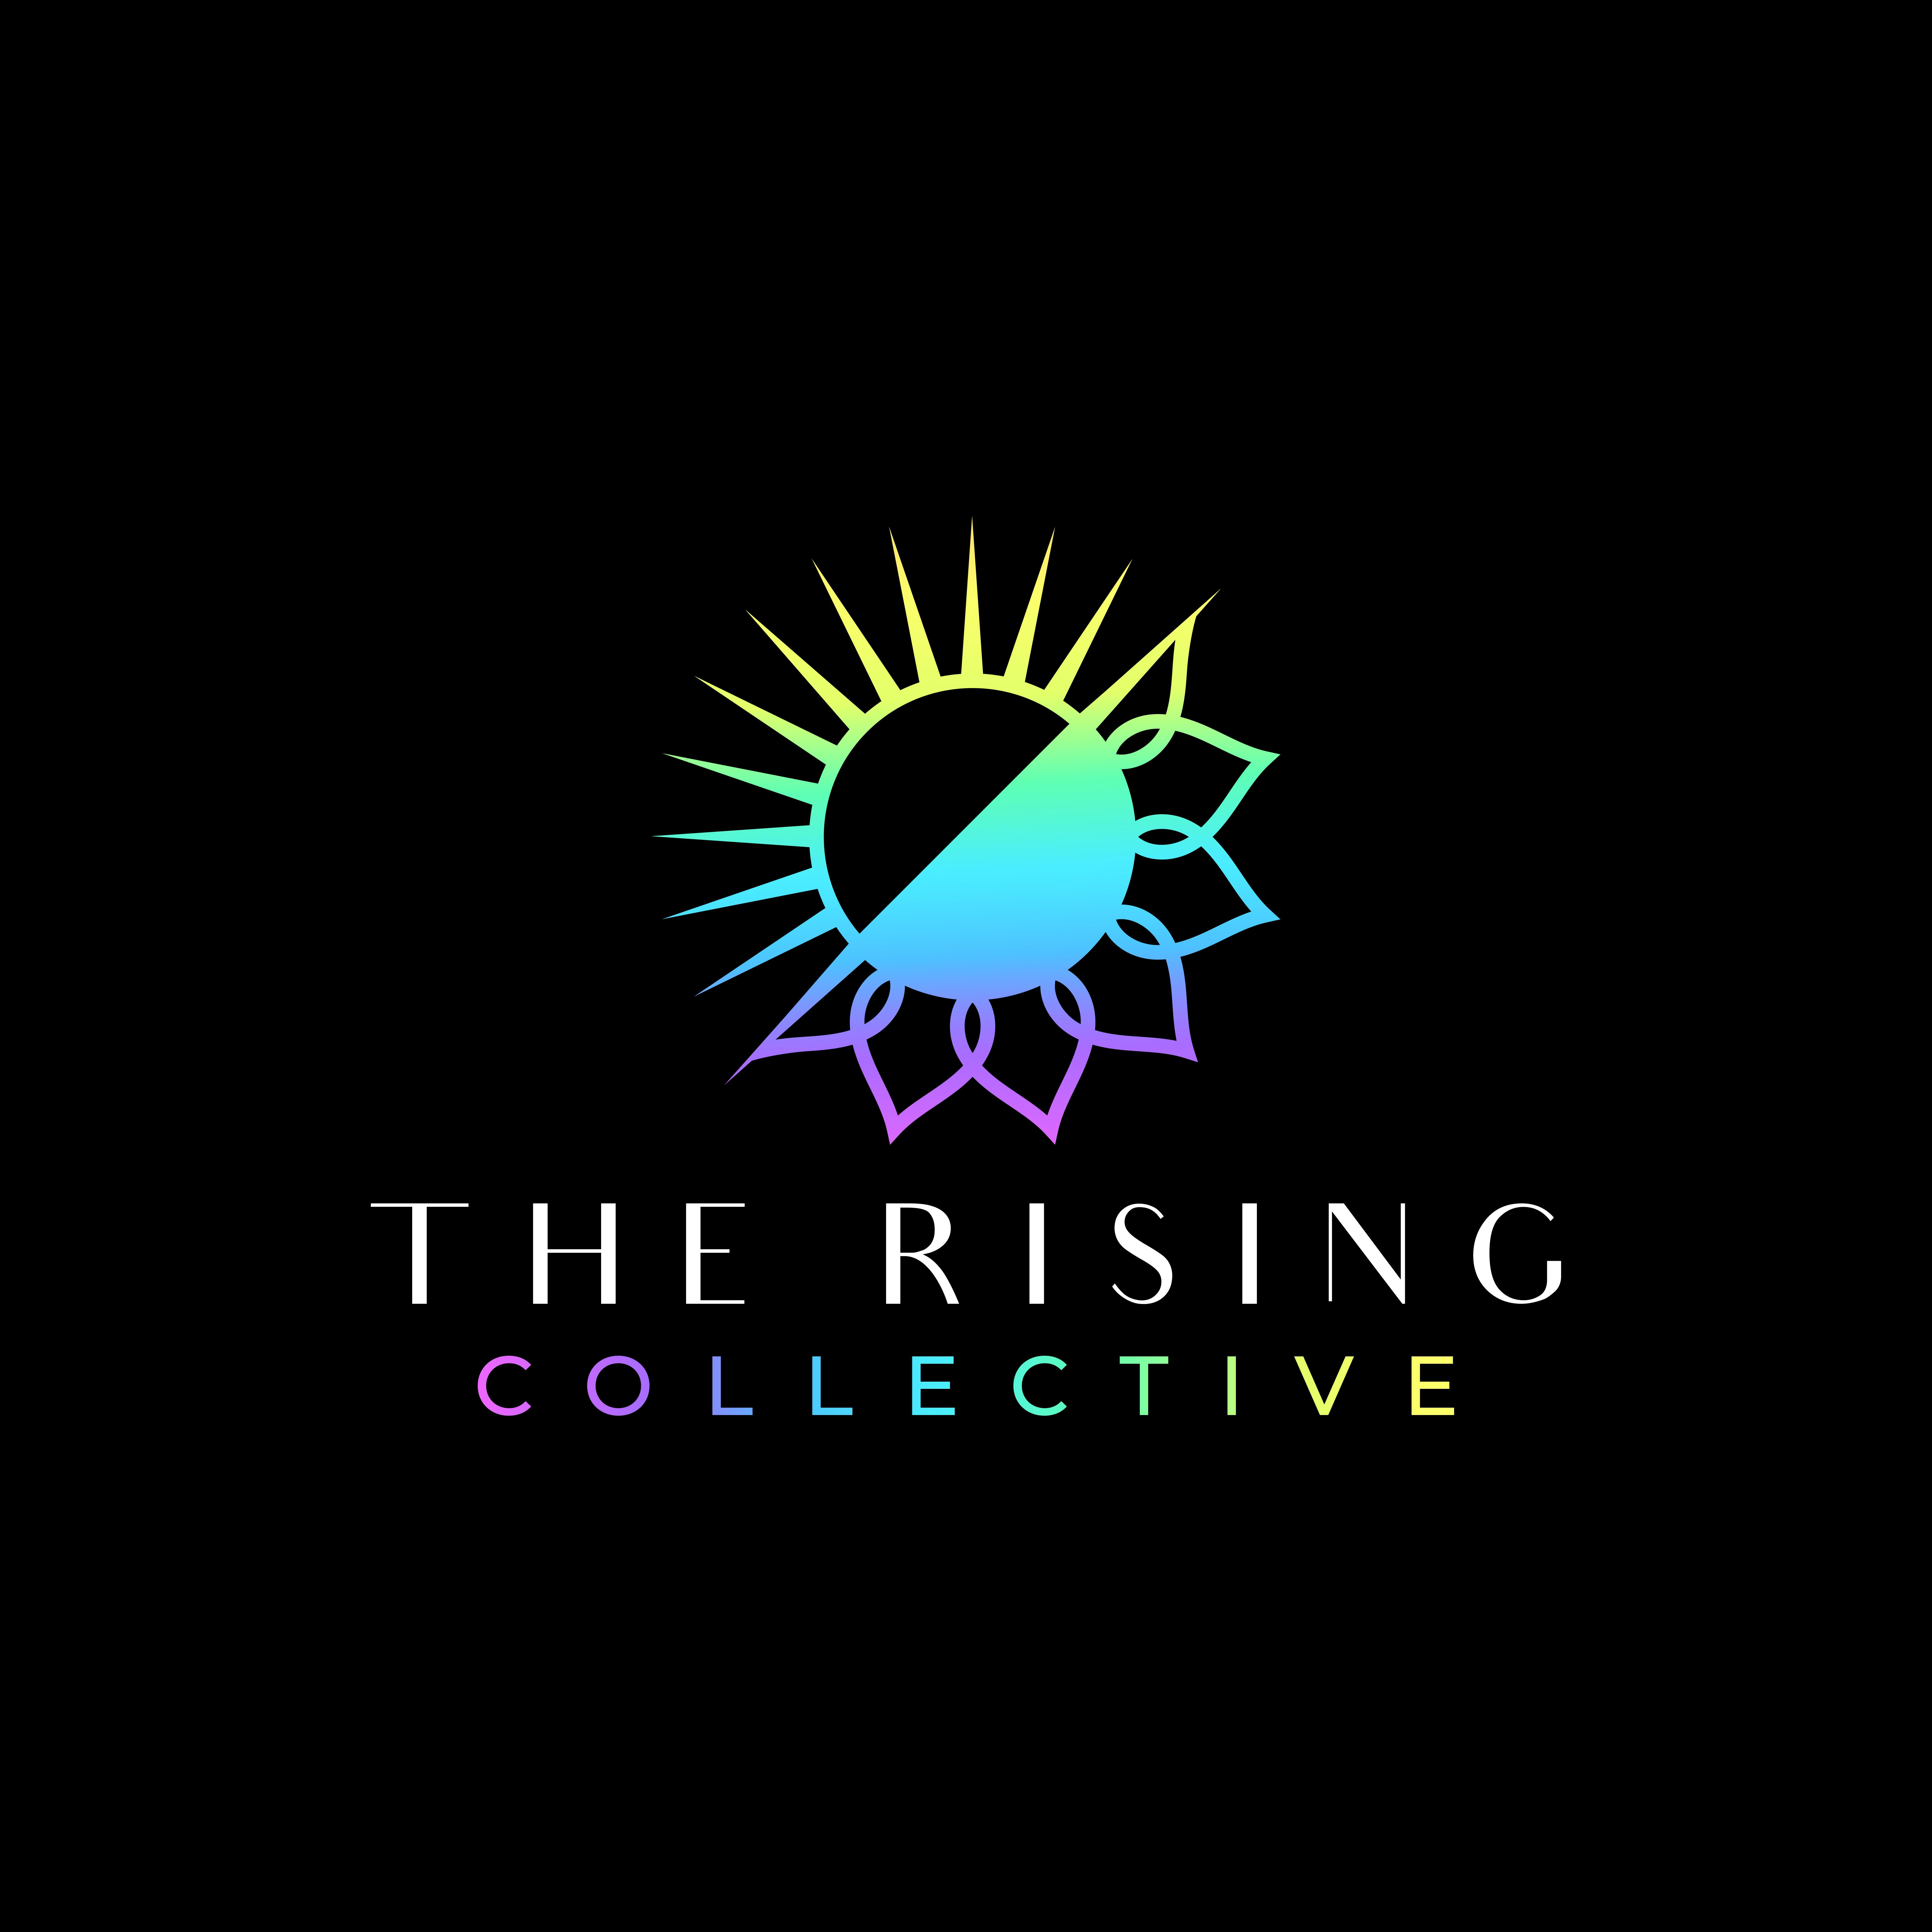 Uplifting & Eye Capturing Logo for Immersive Mind Body Soul Retreat Experiences